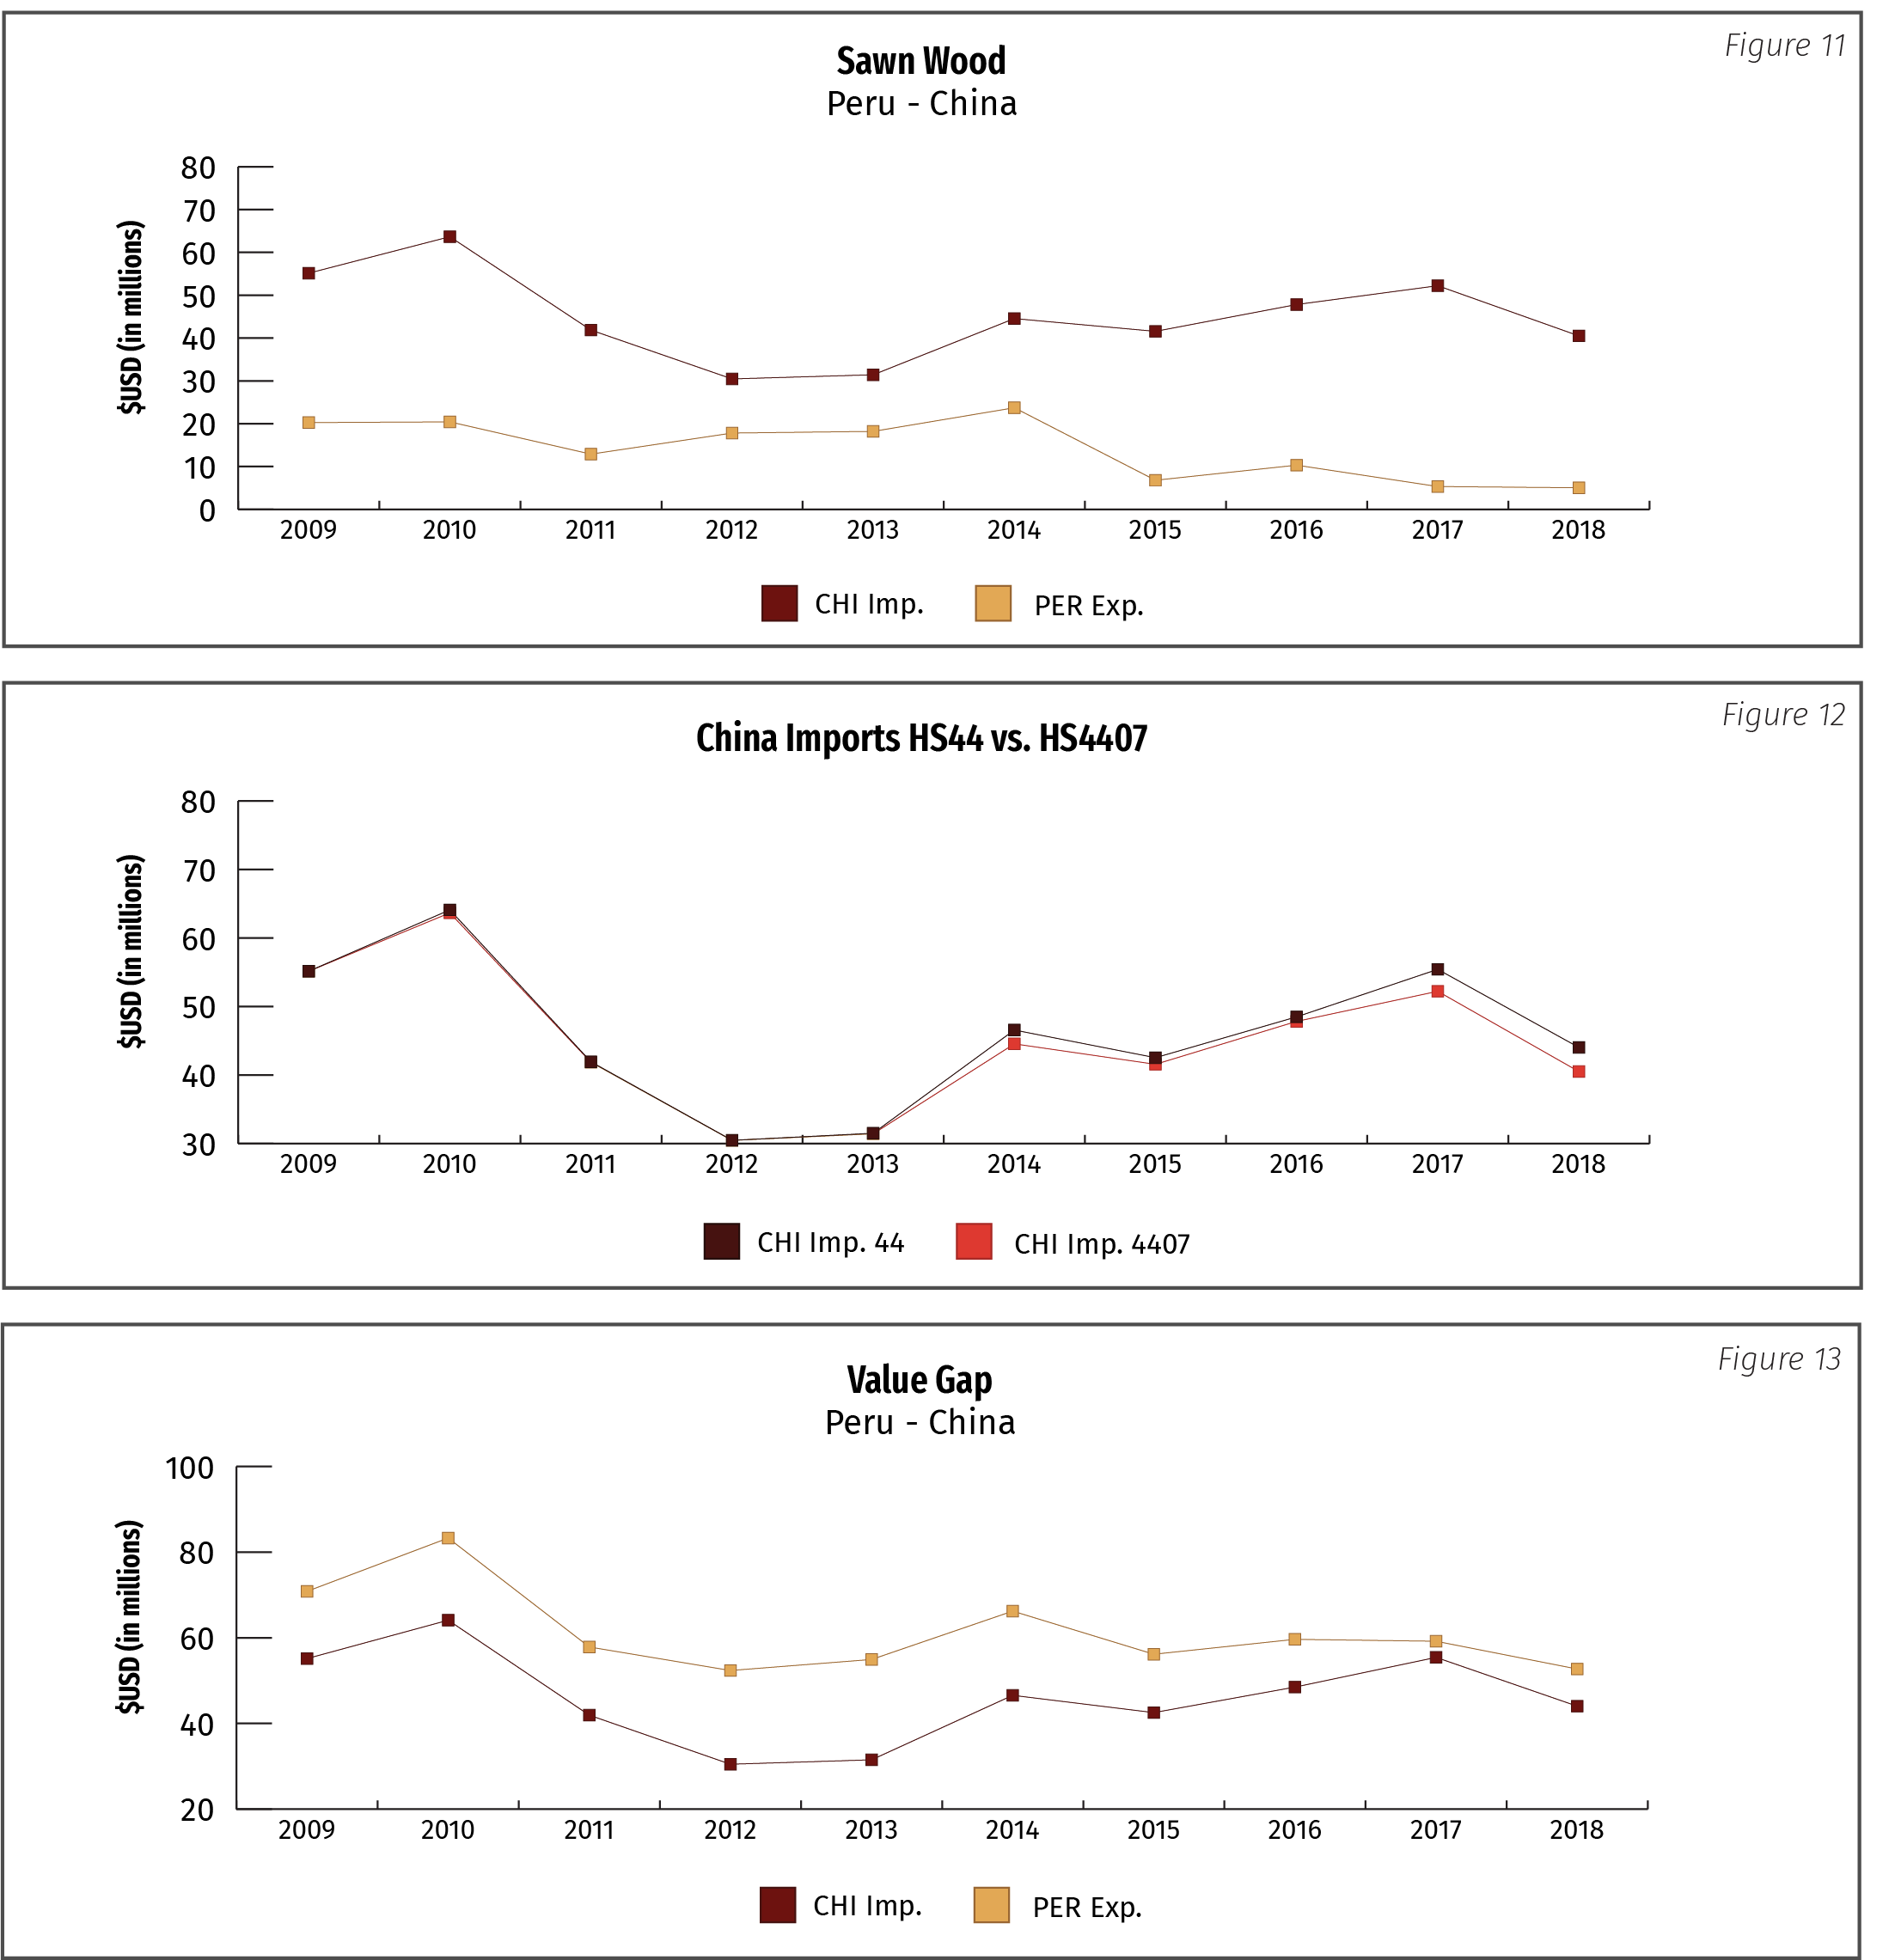 Figure 11: Sawn Wood Peru-China; Figure 12: China Imports HS44 vs HS4407; Figure 13: Value Gap Peru-China